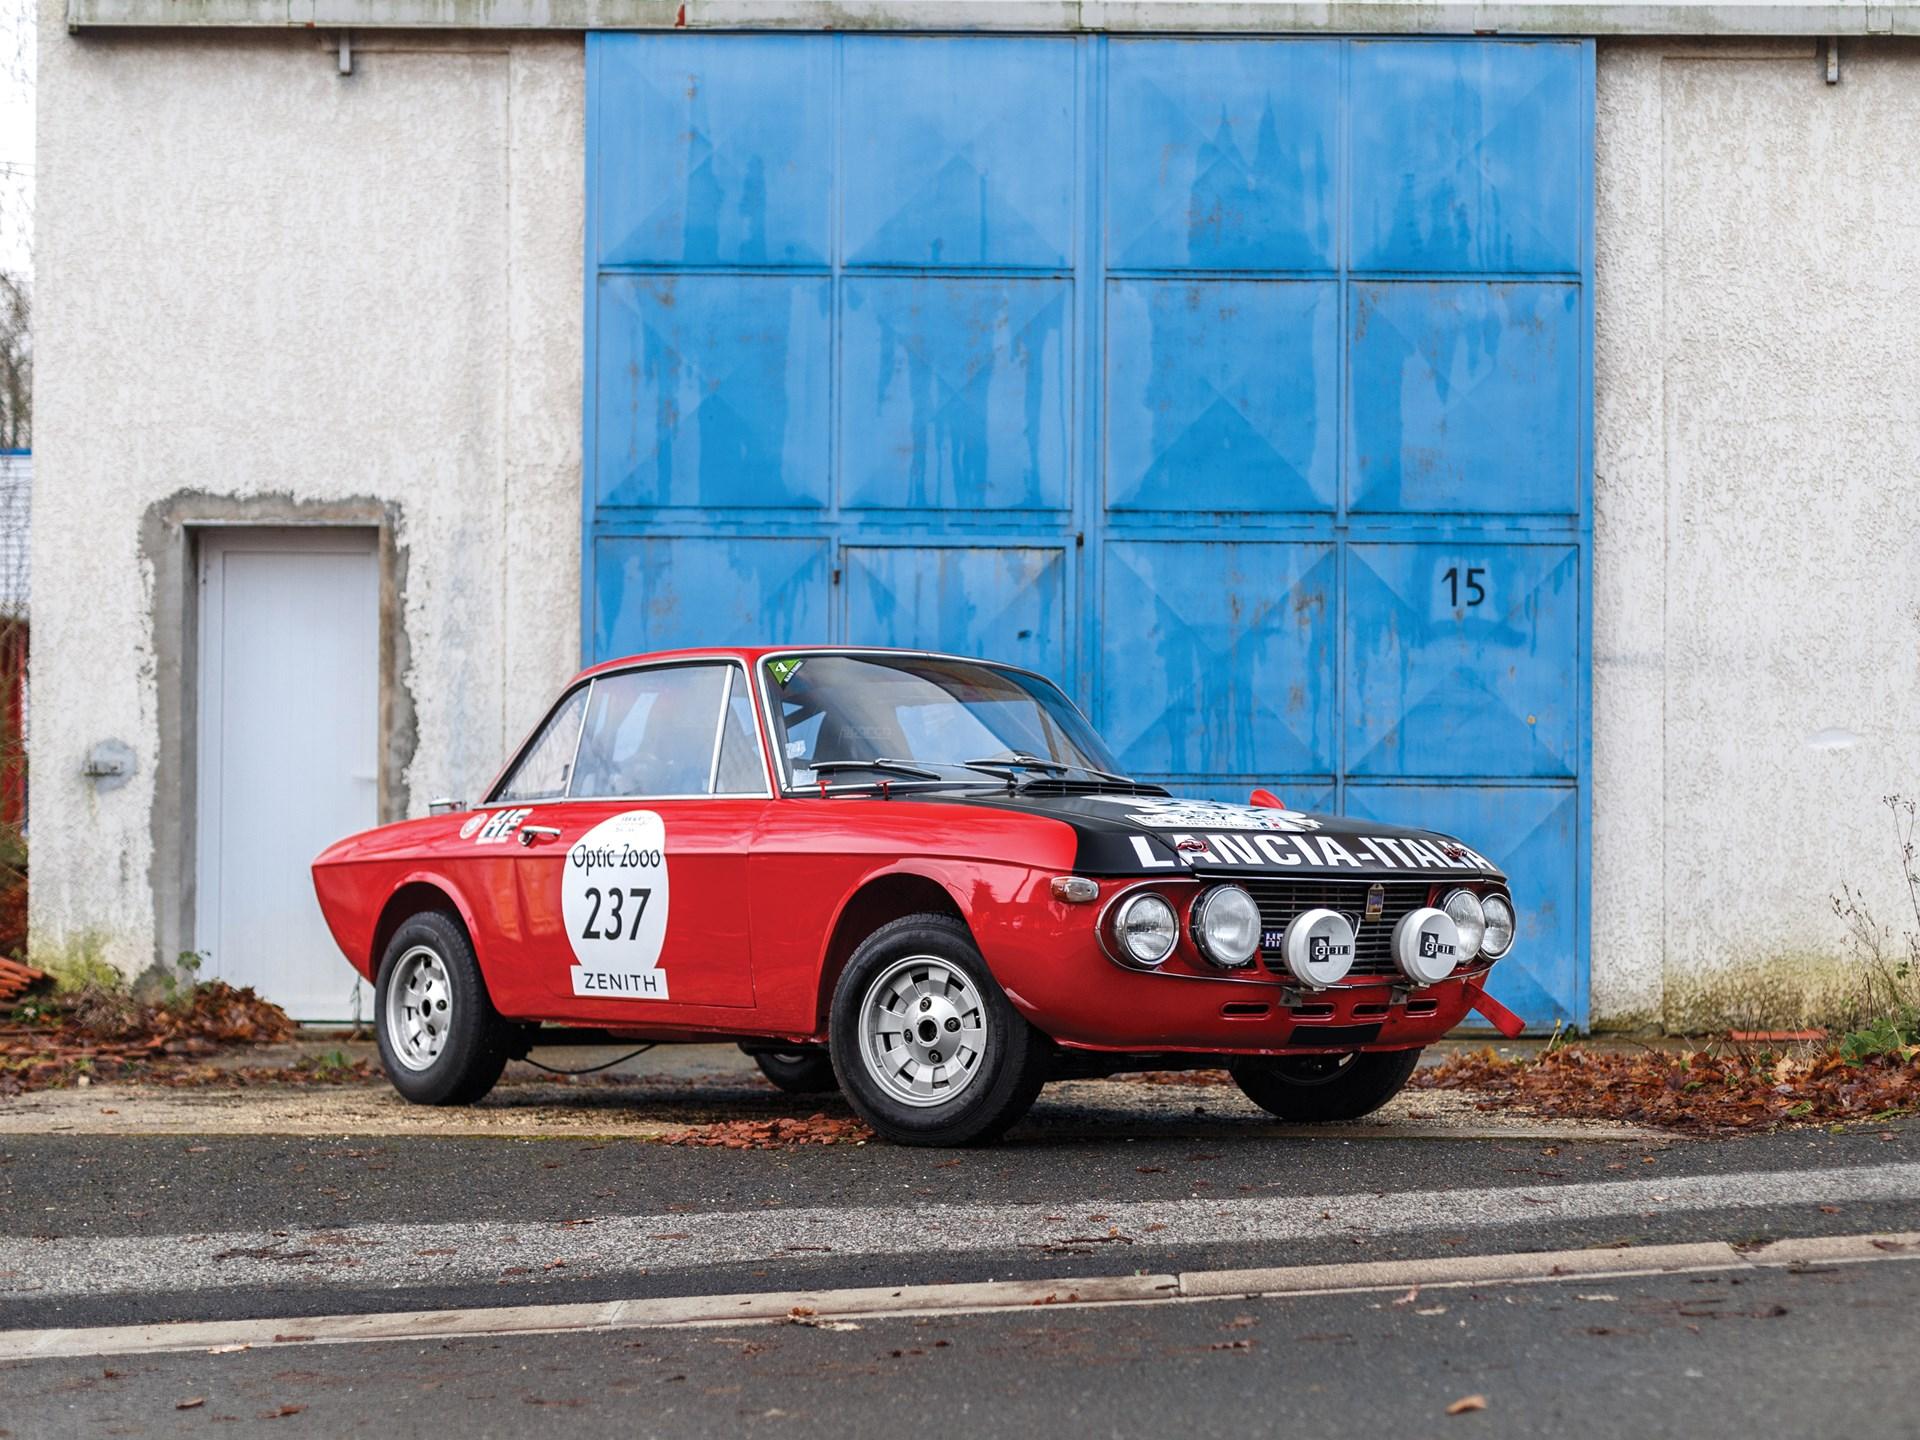 RM Sotheby's - 1970 Lancia Fulvia Rallye 1.6 HF 'Fanalone ...